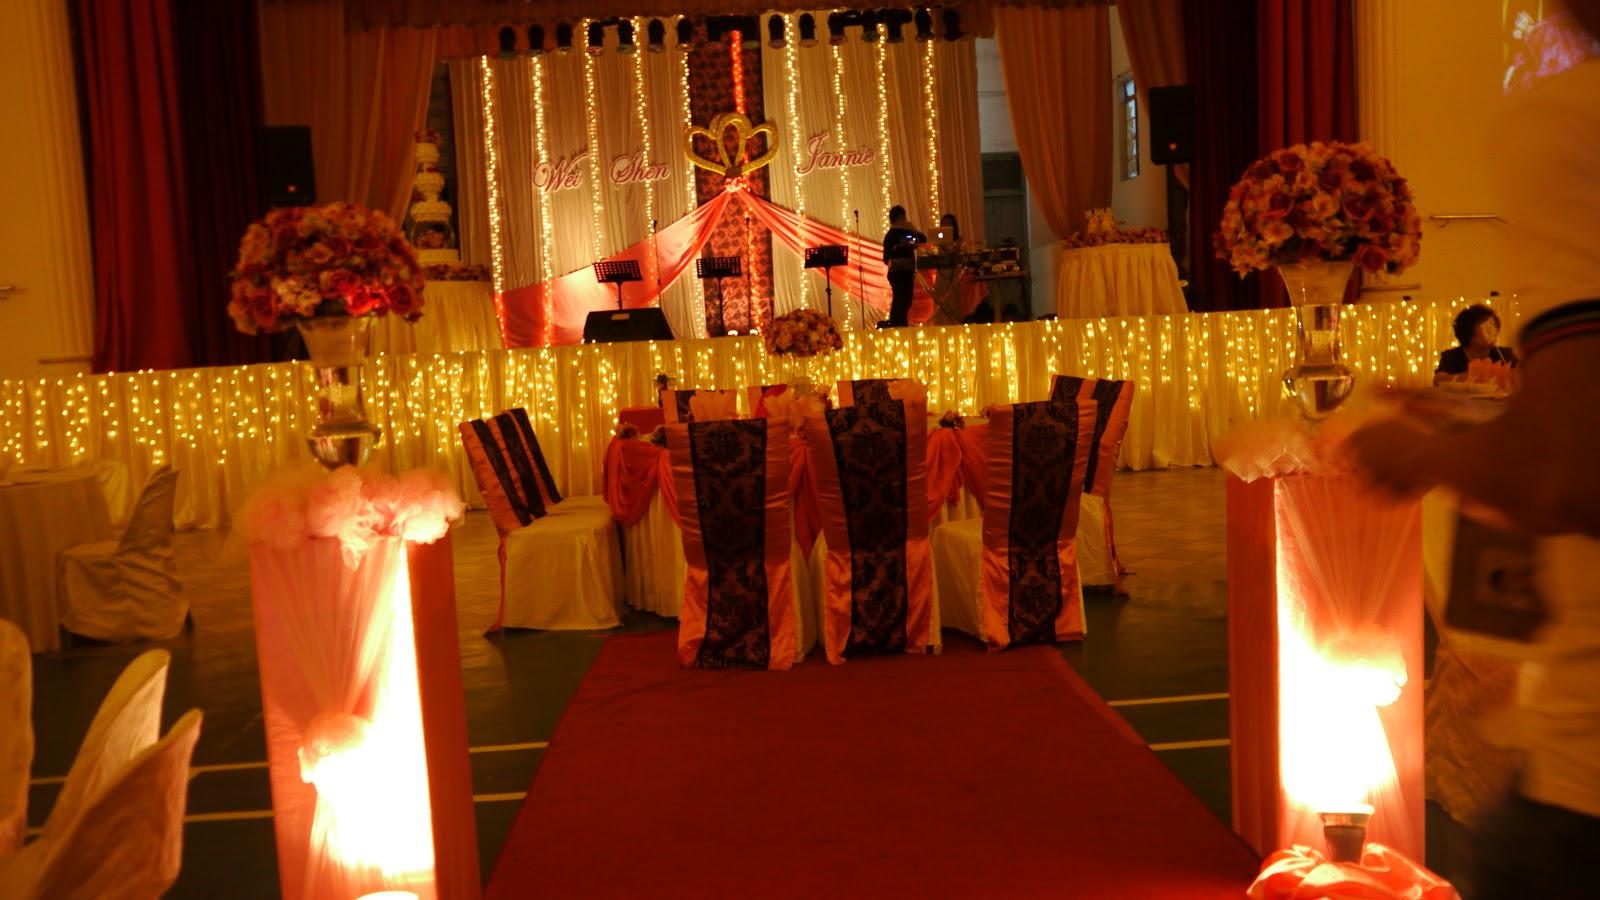 Penang wedding decoration dquest ventures 012 428 0578 penang weding dinner venue decoration by dquest 012 428 0578 junglespirit Choice Image